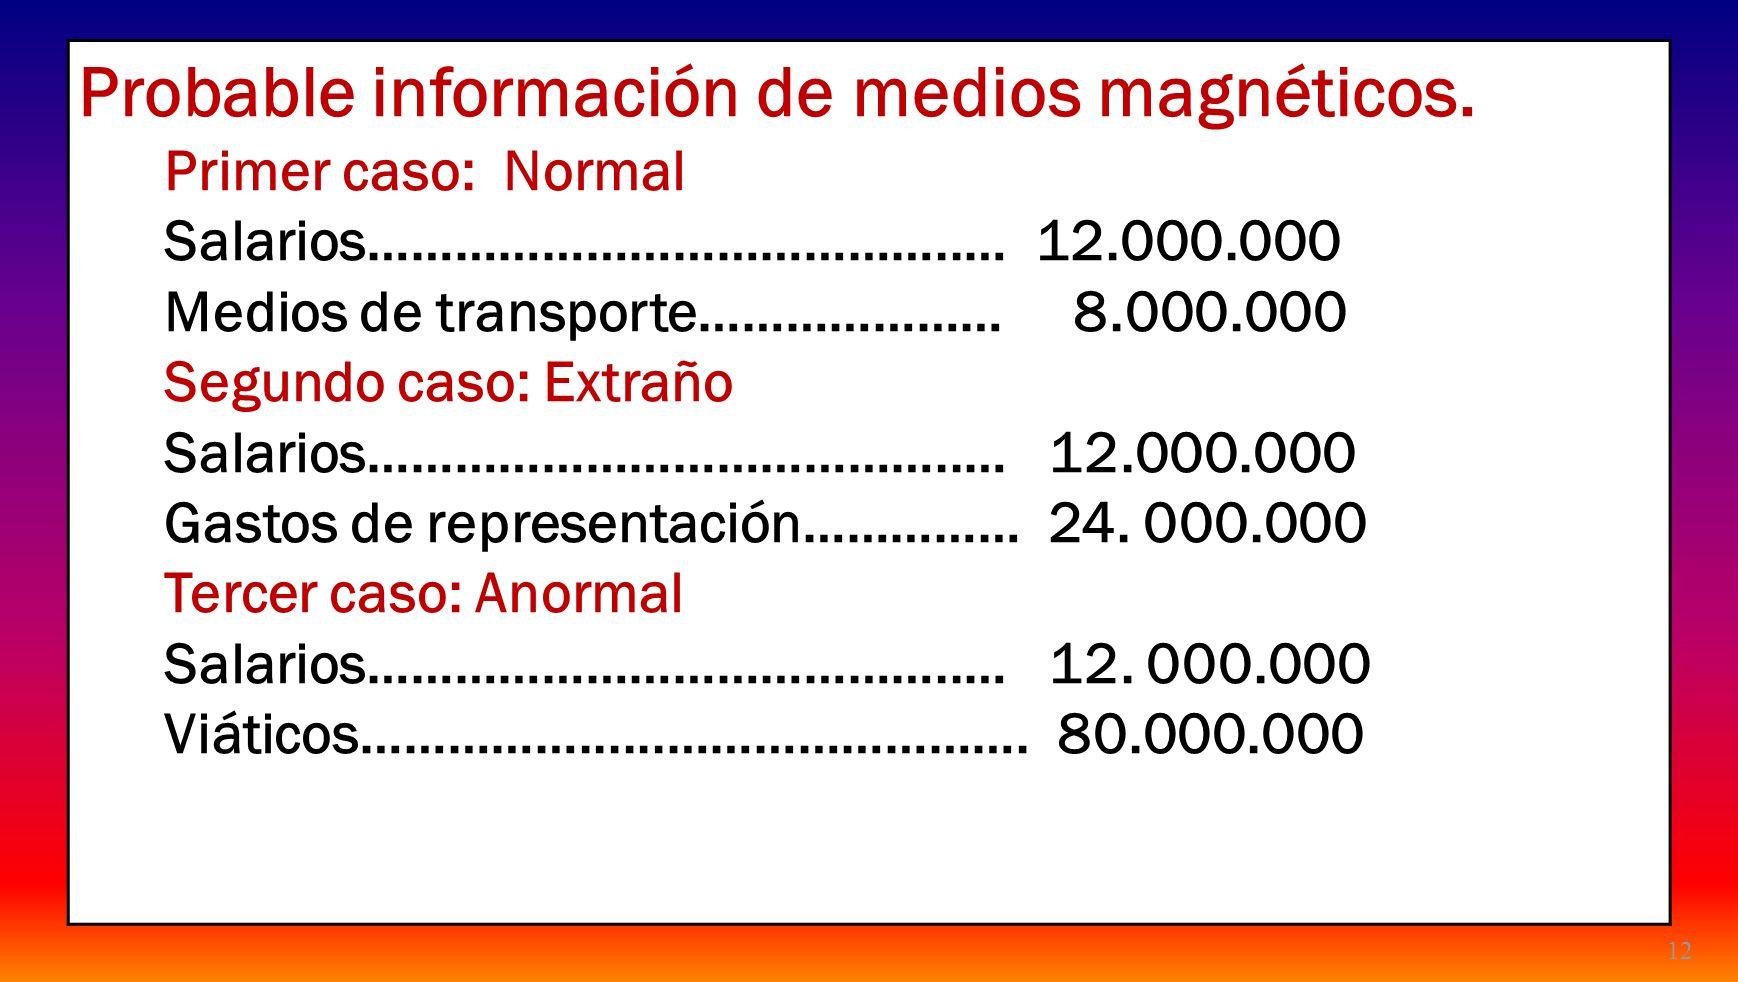 Probable información de medios magnéticos.